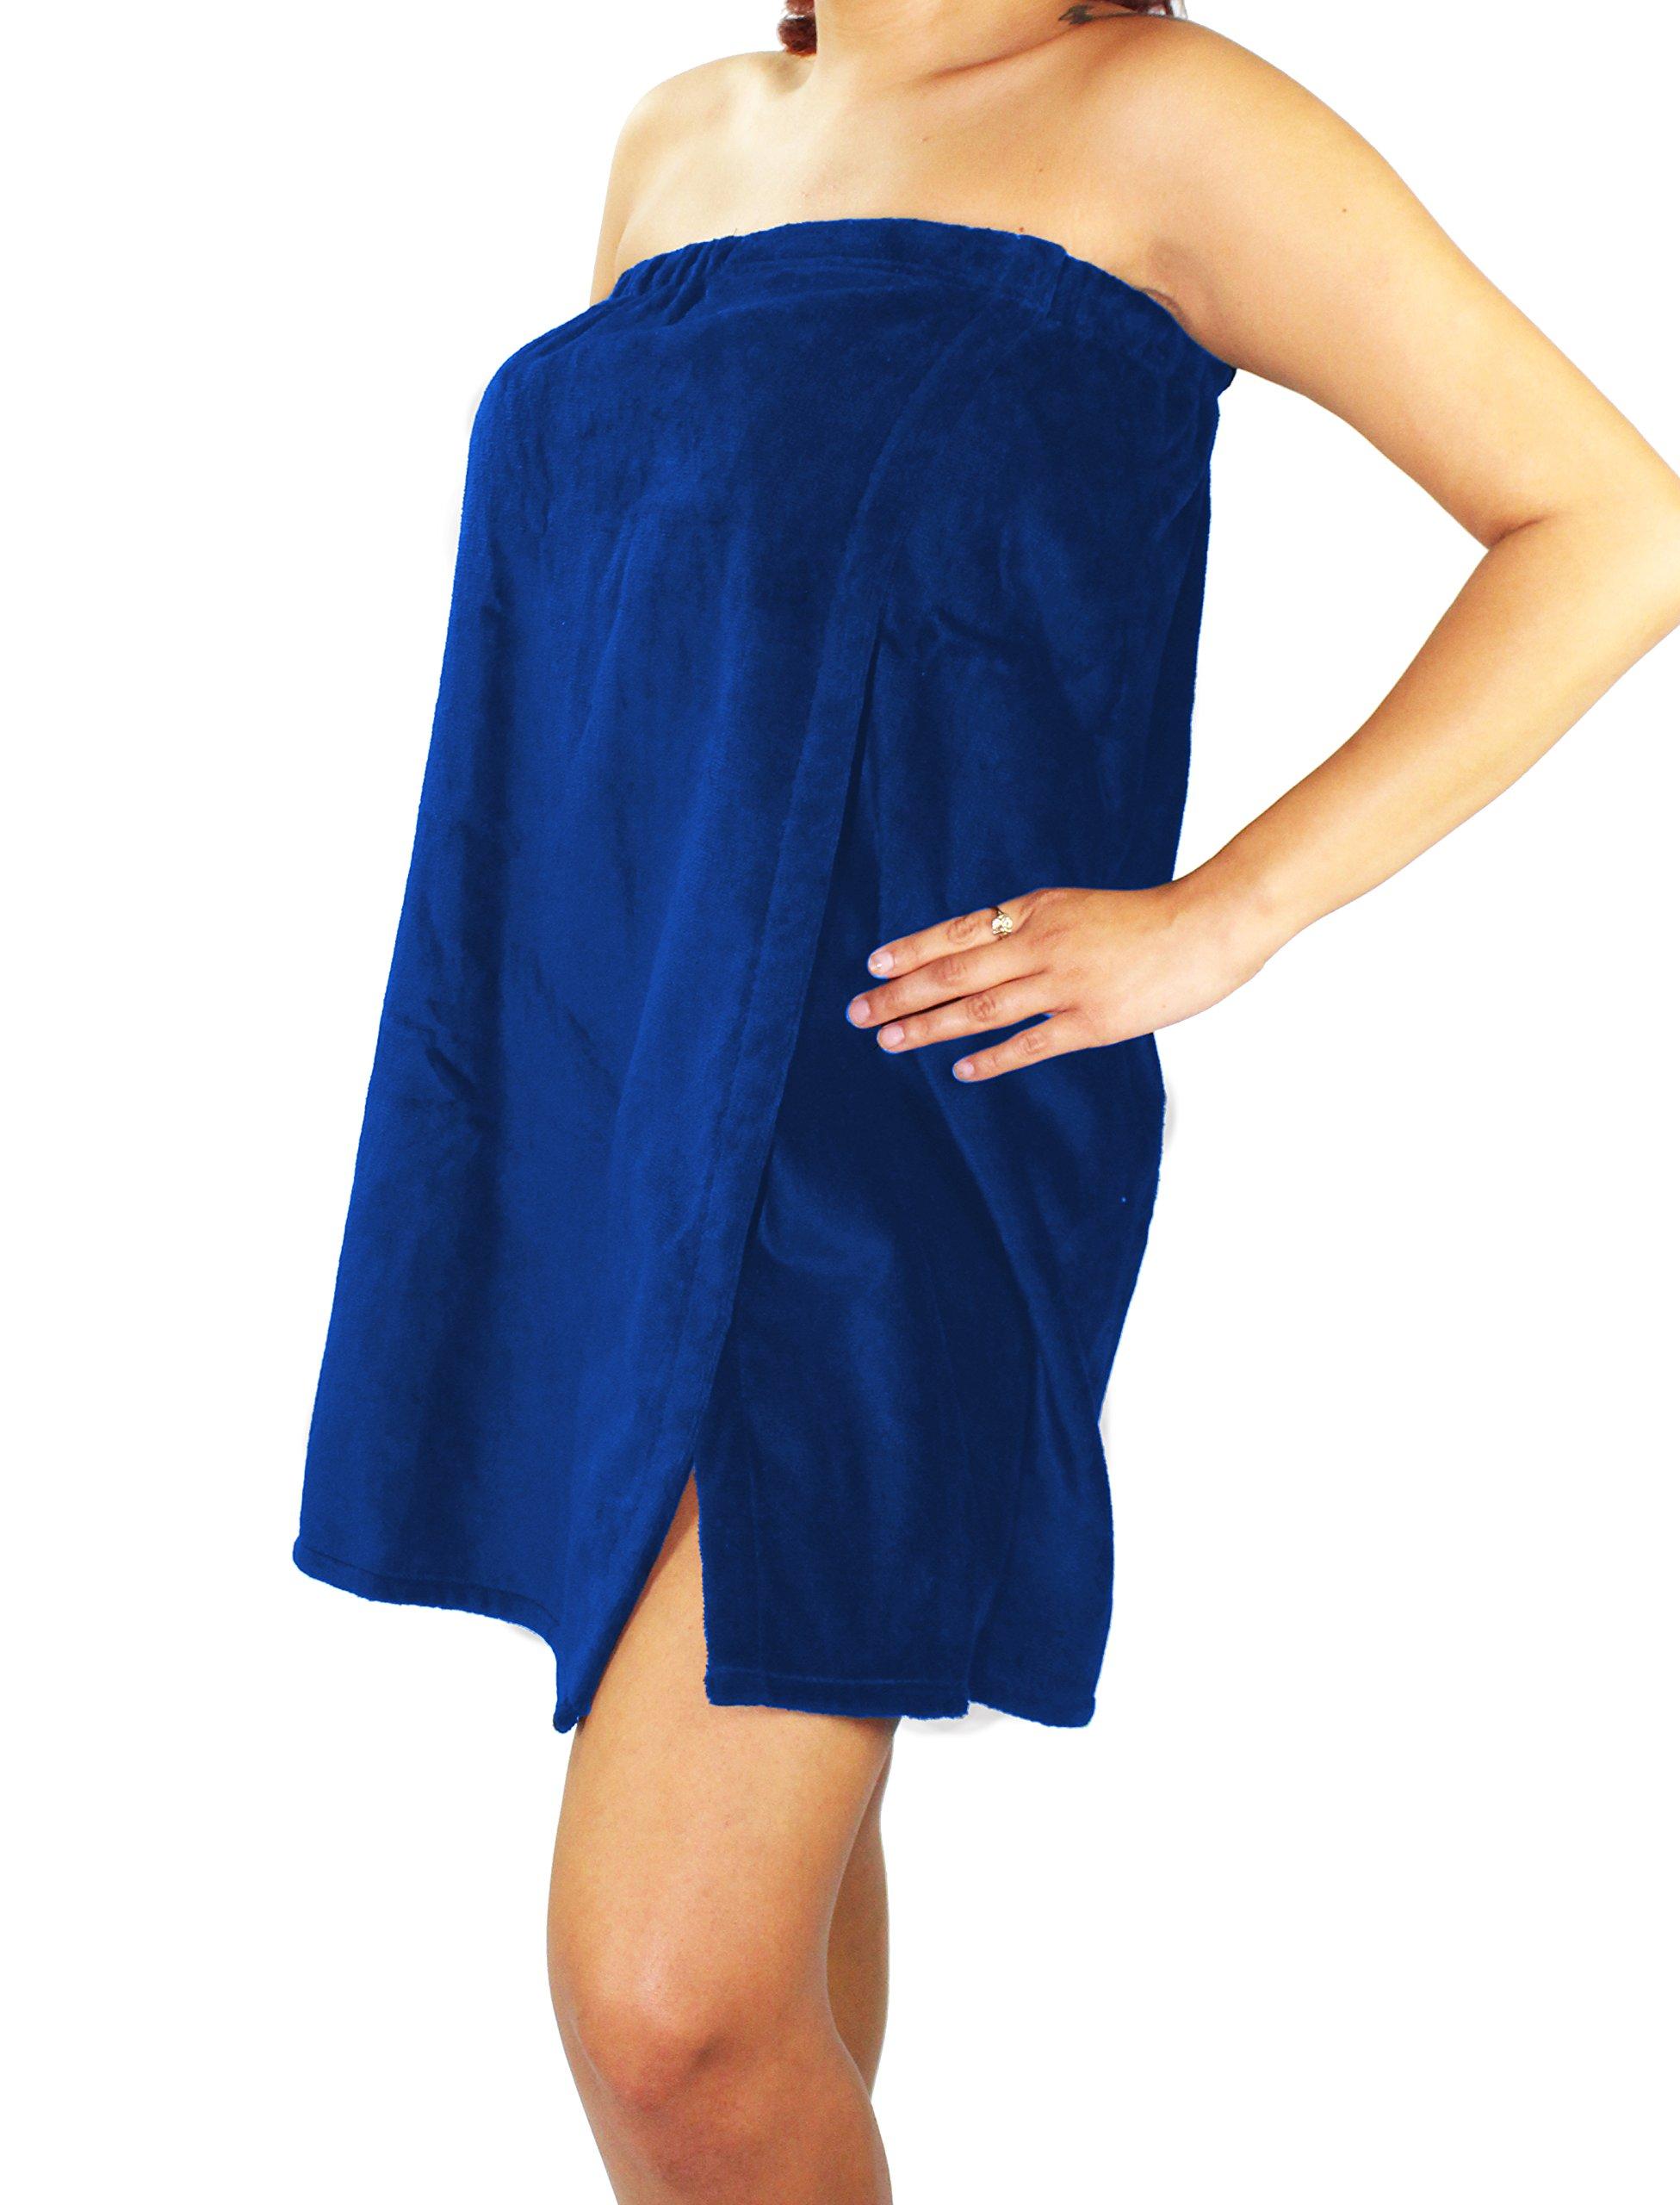 Sanders Classics 25'' Terry Towel Wrap - Royal Blue